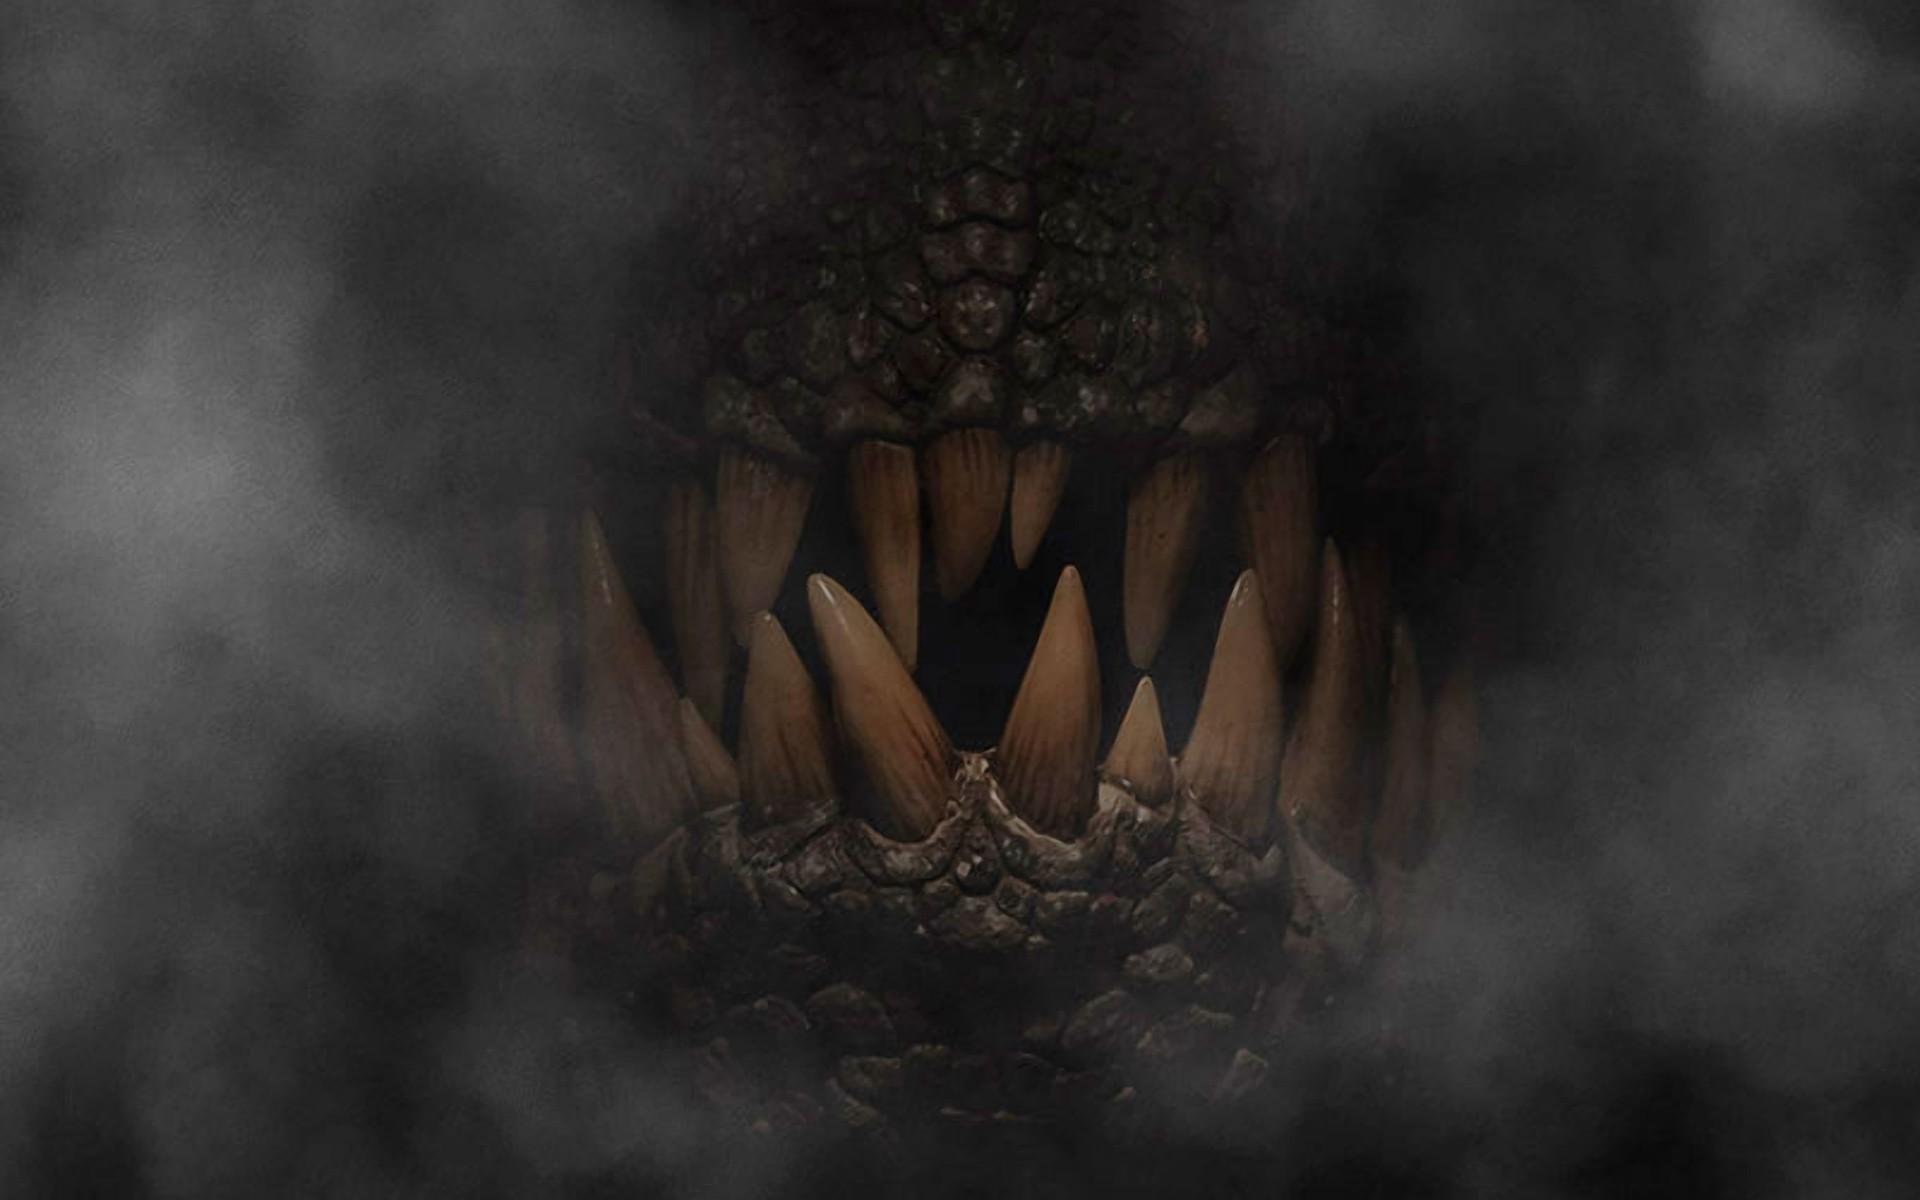 Res: 1920x1200, Dinosaur Indominus Rex Jurassic World Poster Wallpaper